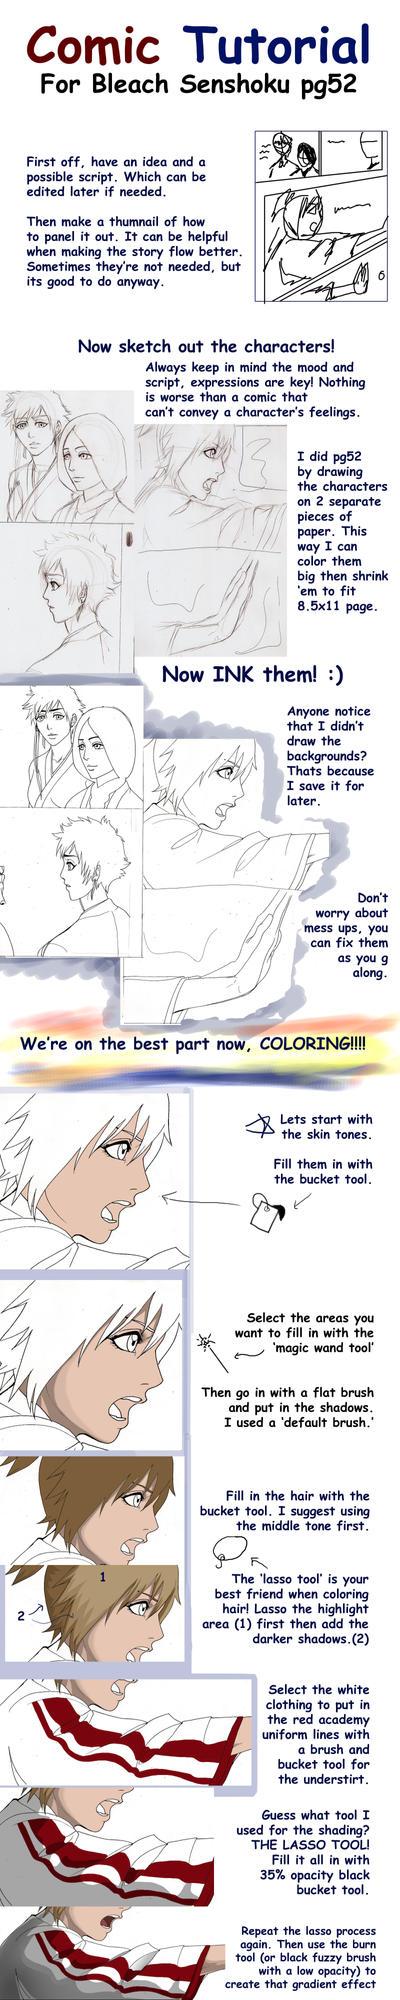 Comic Tutorial part1 by CheshFire